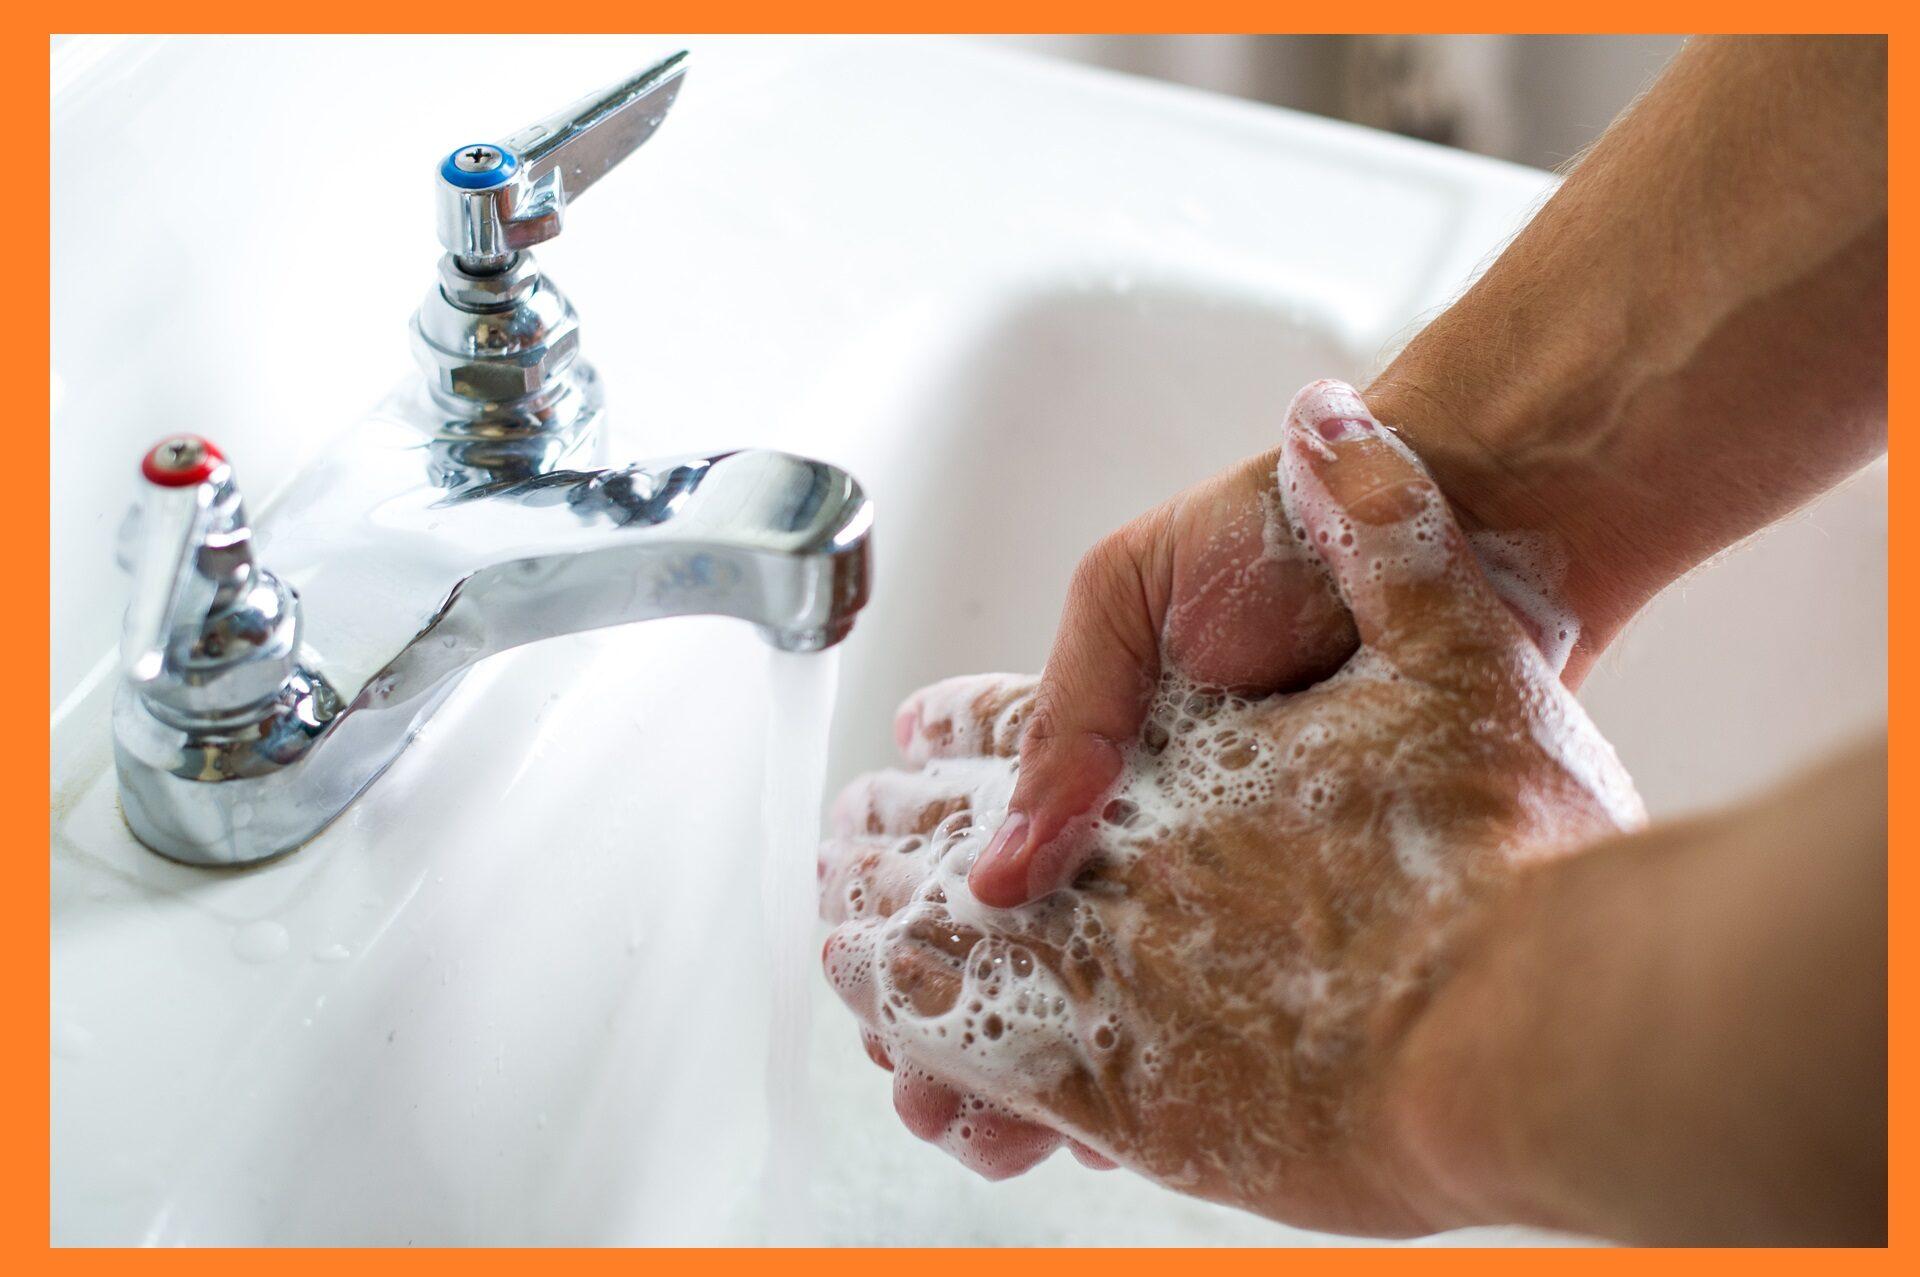 hand-washing-photo-5589986